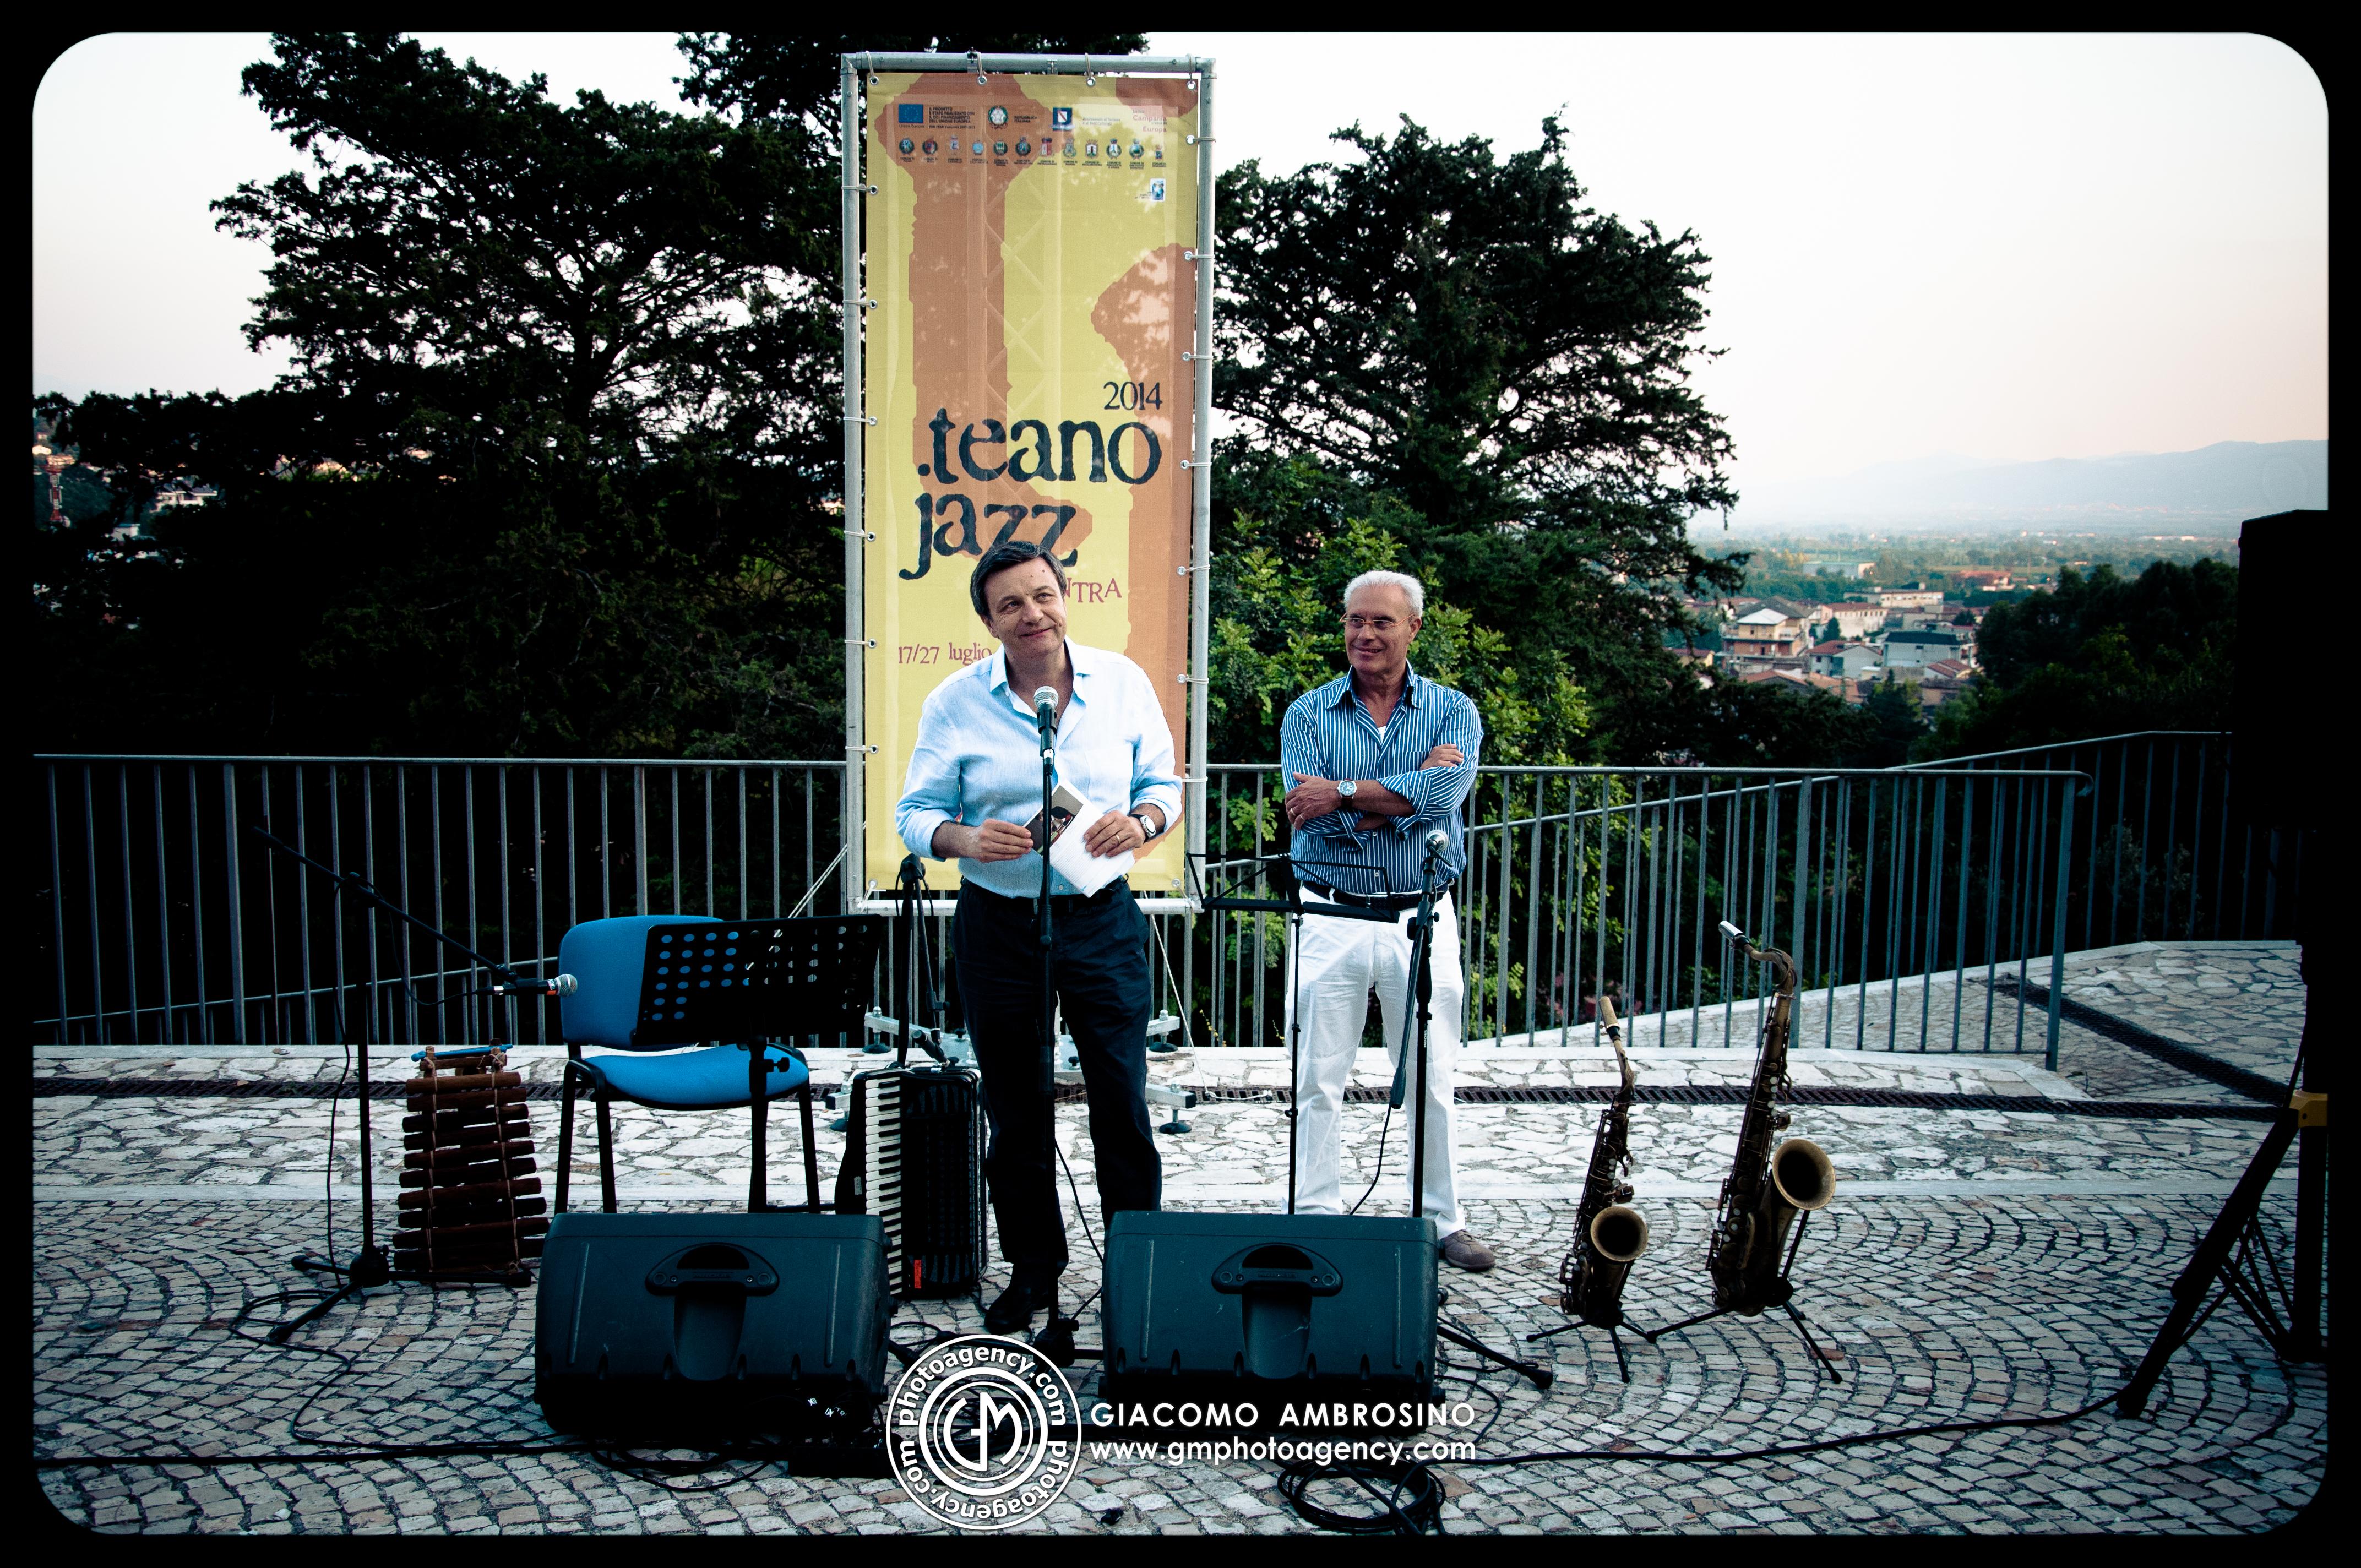 Teano Jazz 2014 – Pasquale Innarella e Livio Minafra, Nicola Conte Jazz Combo (Piedimonte Matese) e Giovanni Francesca Quintet (Pietramelara)